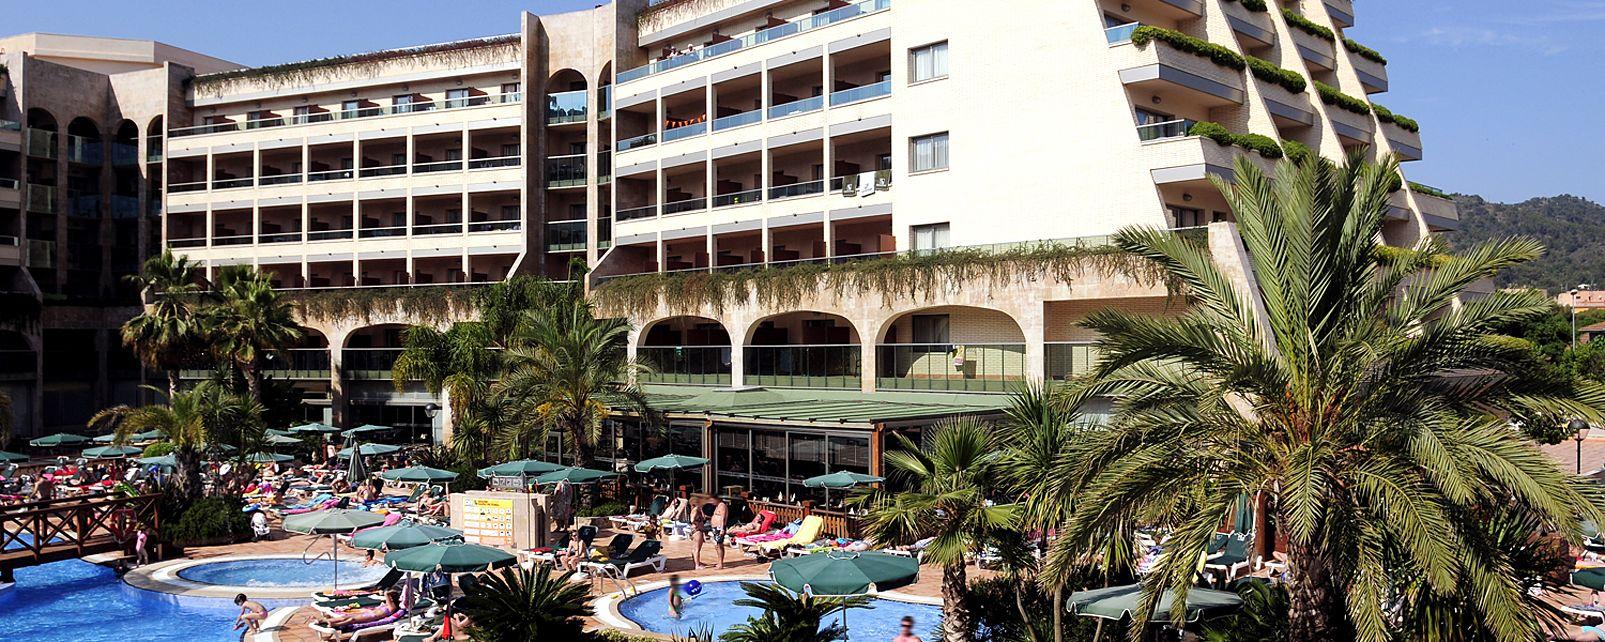 Hotel Golden Bahia Tossa De Mar